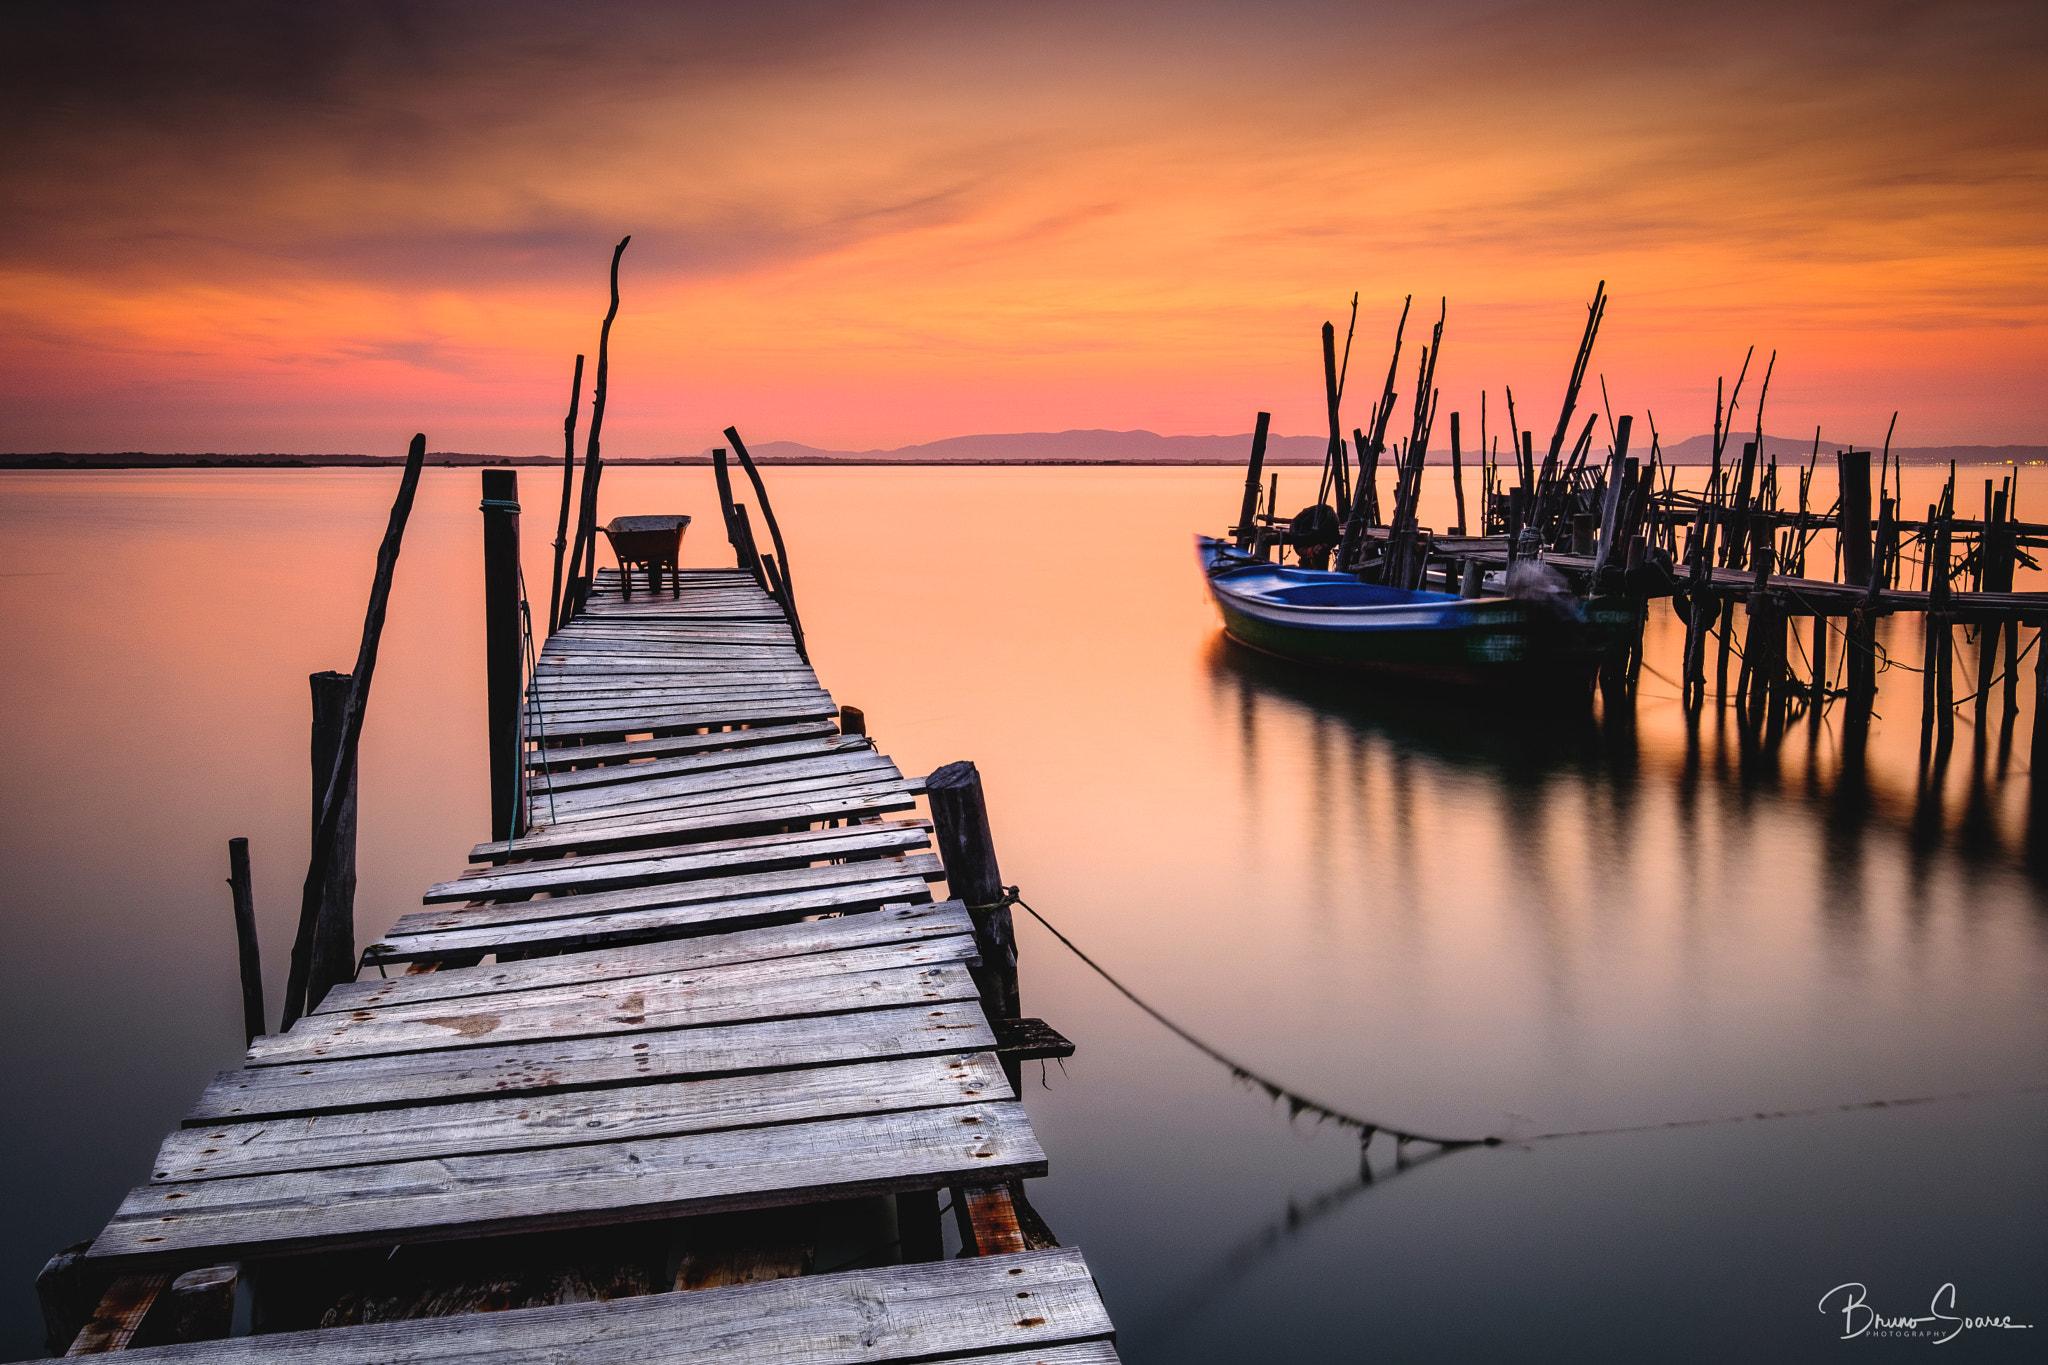 Bruno Soares Landscape Sunset Horizon Sky Colorful Pier Wooden Surface Water Boat Dock 2048x1365